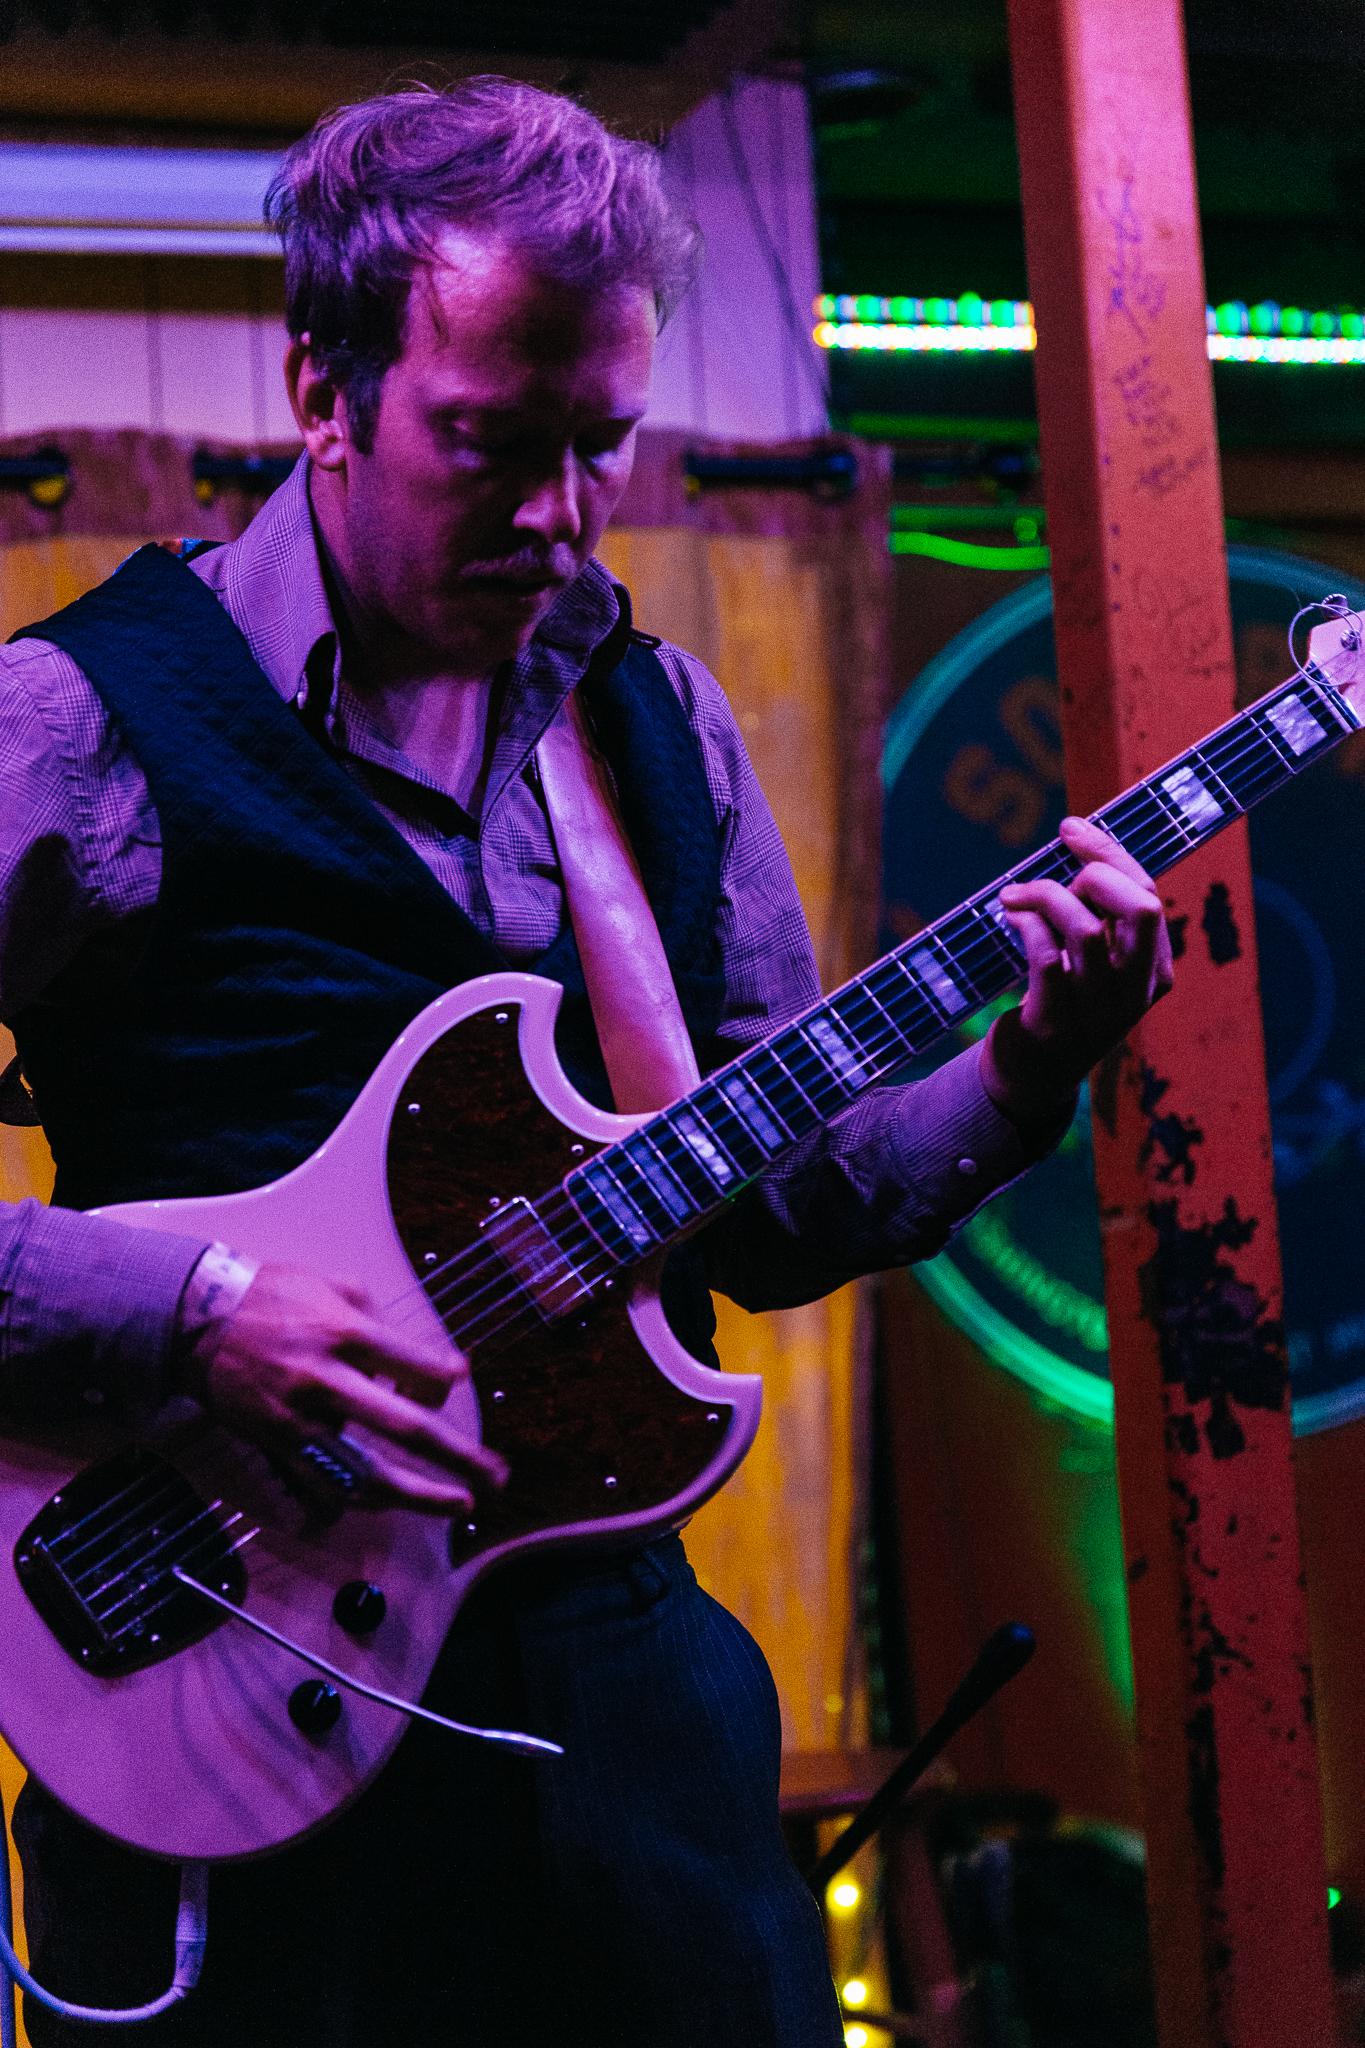 The Mattson 2 at Songbyrd (Photo by Mauricio Castro /  @themauricio )